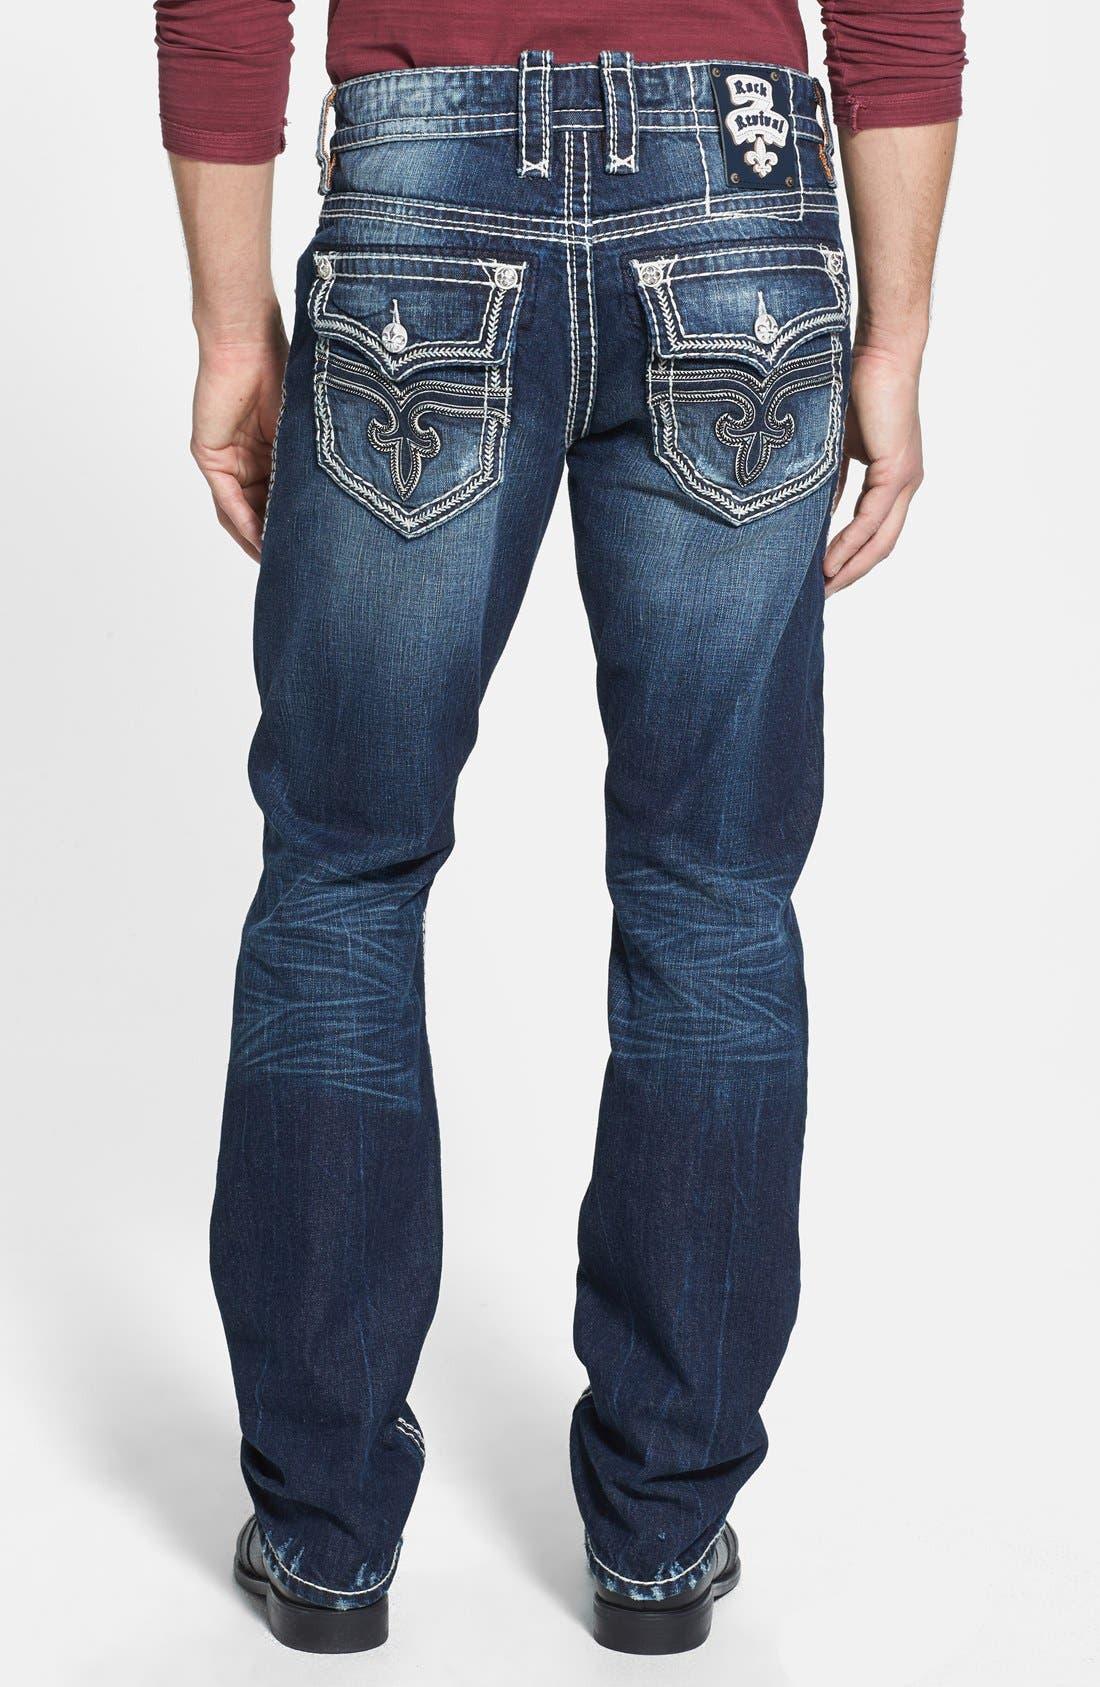 Alternate Image 1 Selected - Rock Revival 'Saul' Straight Leg Jeans (Dark Blue)